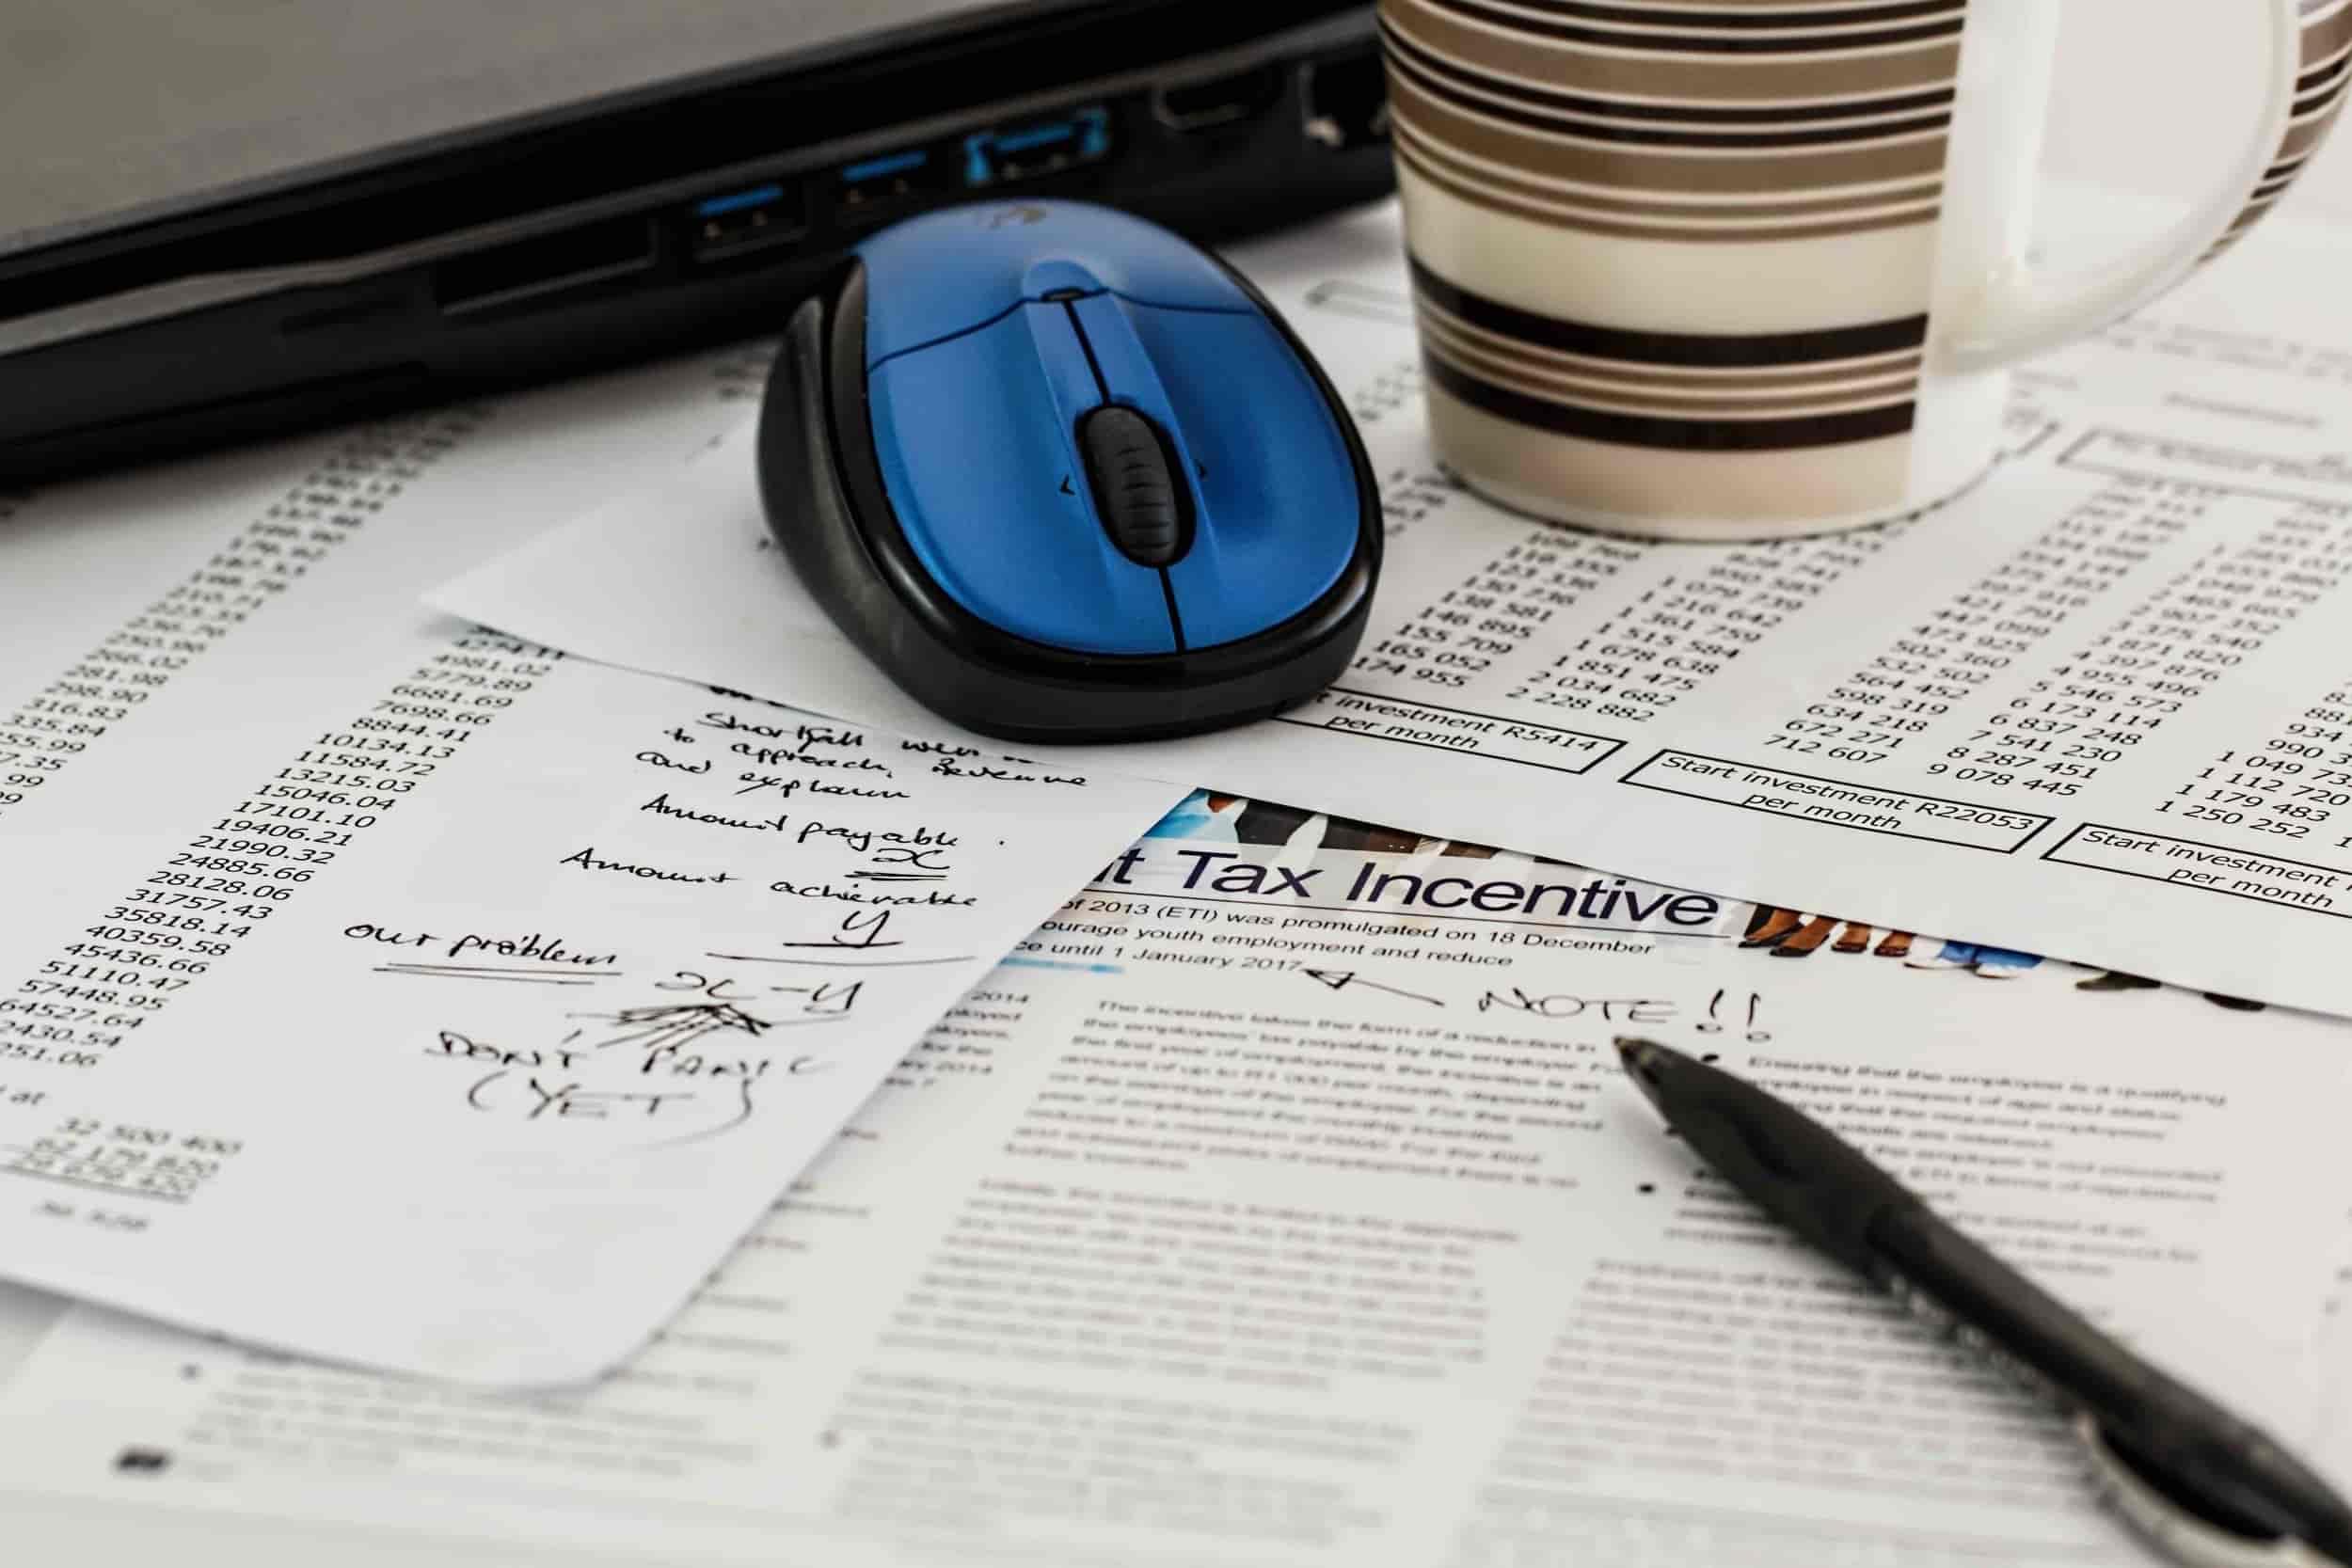 sba-express-loan-application-checklist.jpg